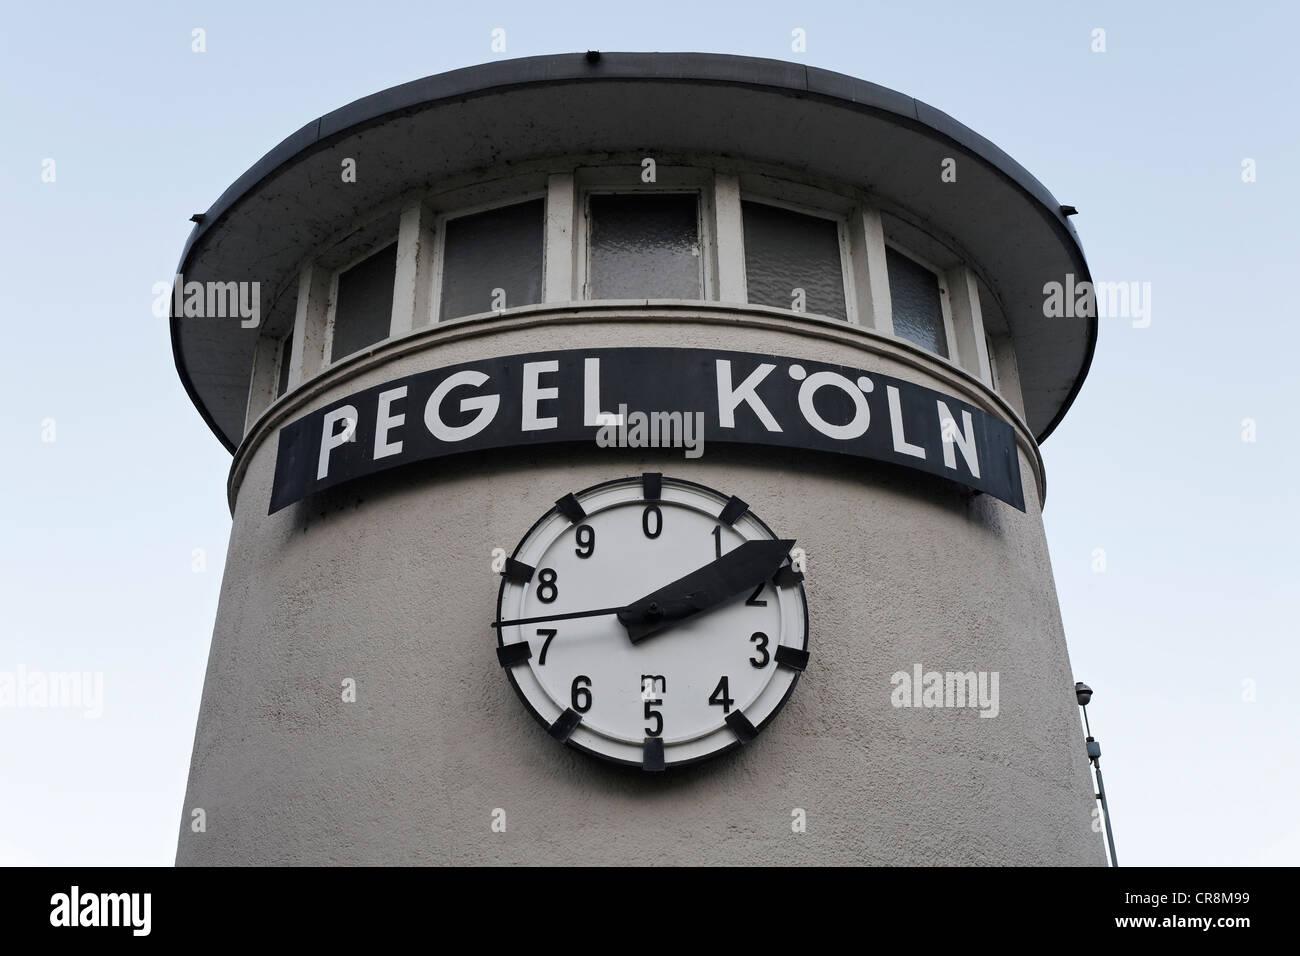 Level Cologne, clock with water level indicator, North Rhine-Westphalia, Germany, Europe - Stock Image